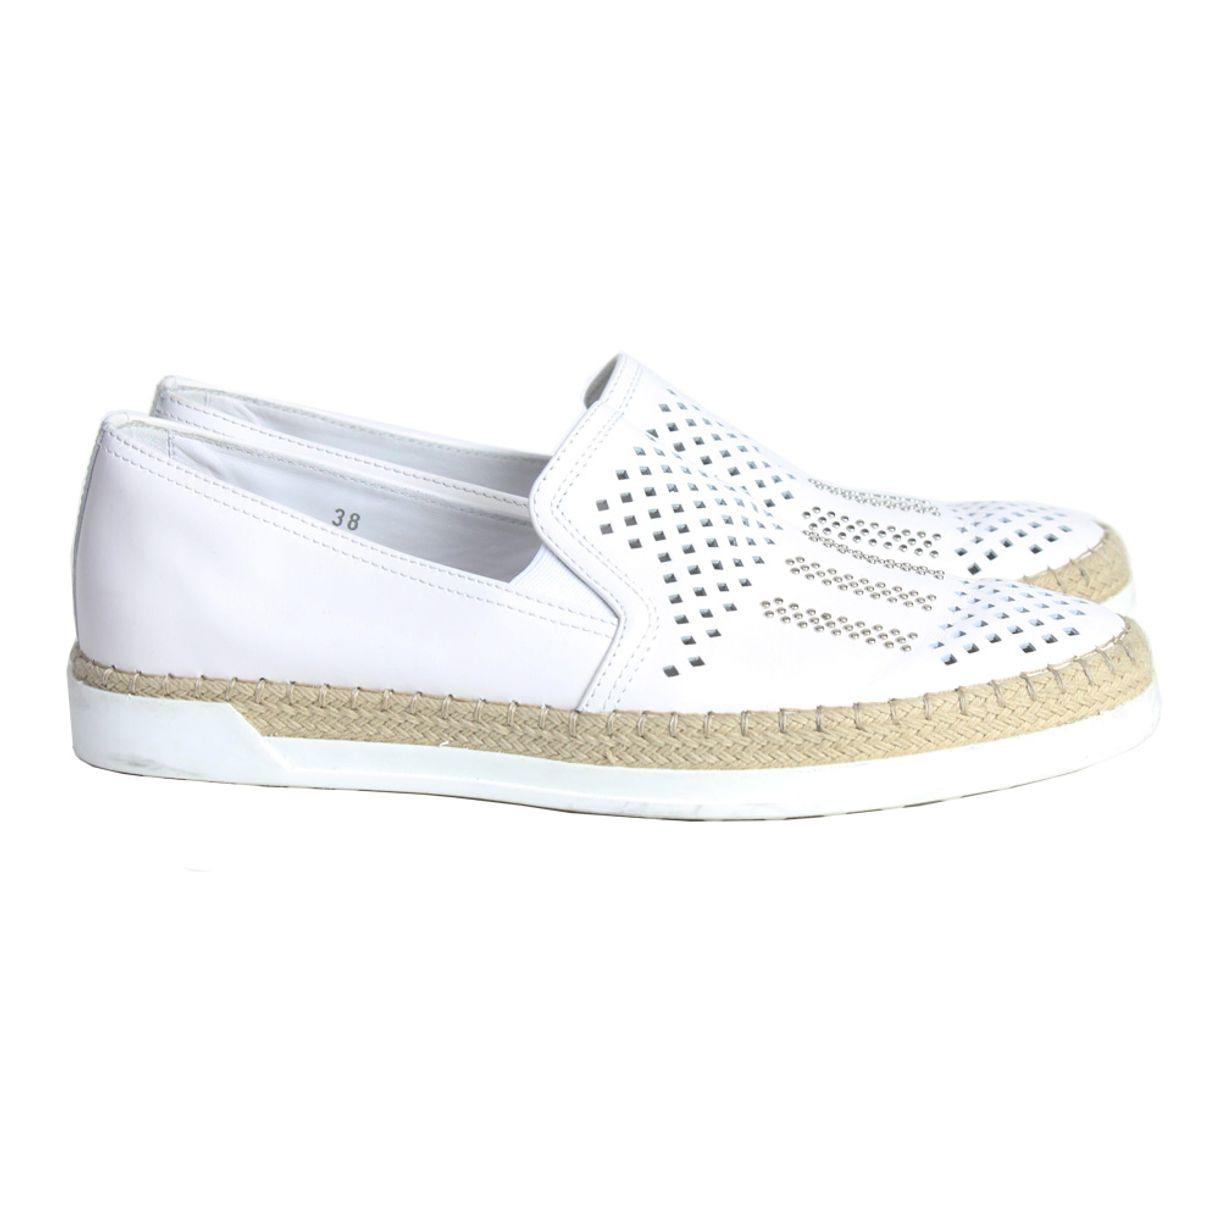 slipper-tods-couro-branco